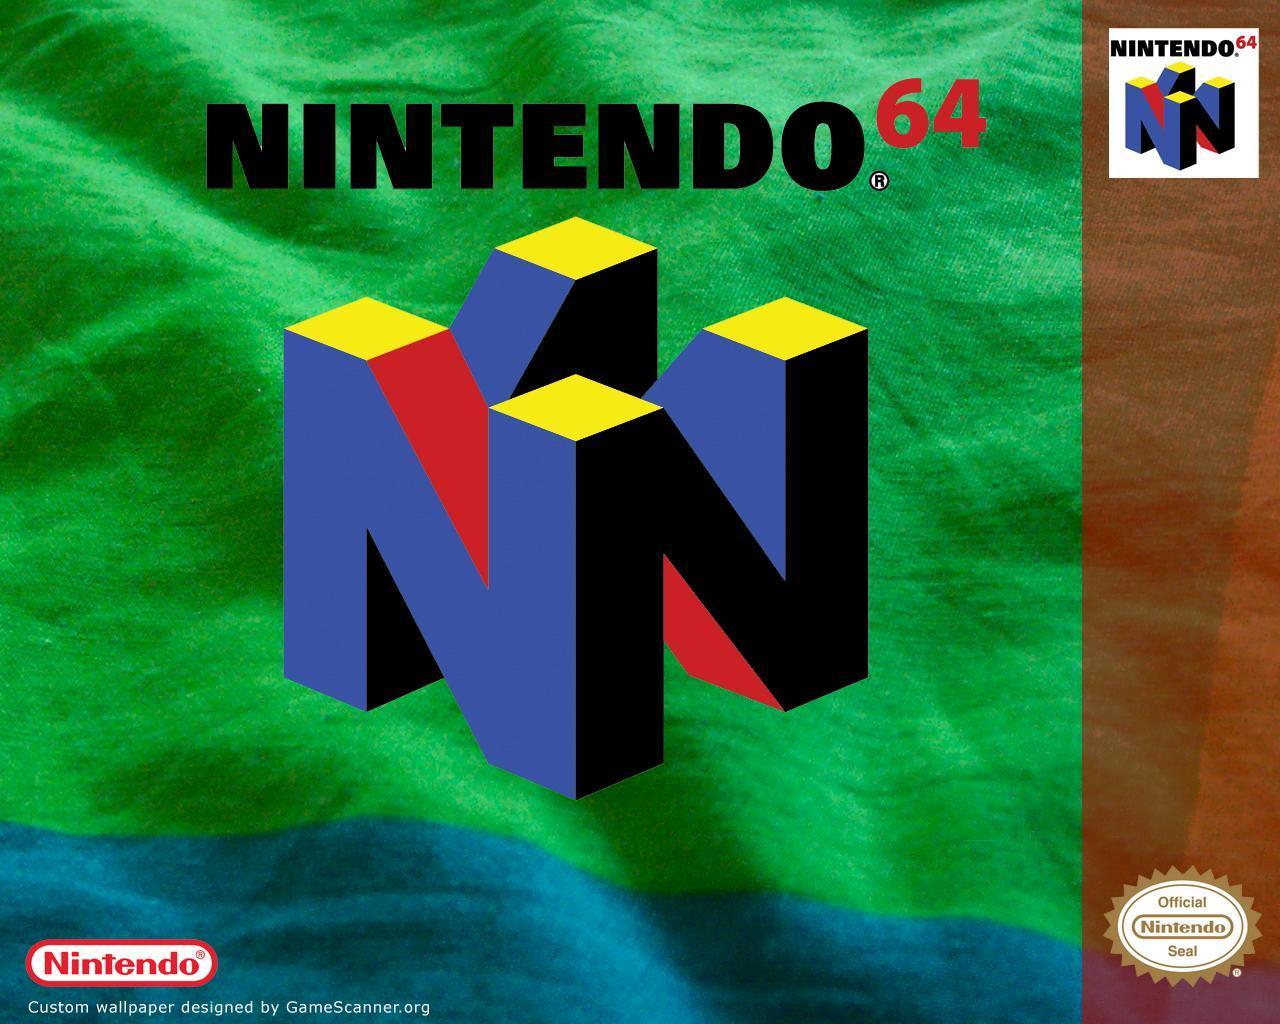 Free Download Nintendo 64 N 64 Wallpaper 26503012 1280x1024 For Your Desktop Mobile Tablet Explore 49 Nintendo 64 Wallpaper Nintendo Wallpapers Hd Nintendo Desktop Wallpaper Mario Kart 64 Wallpaper